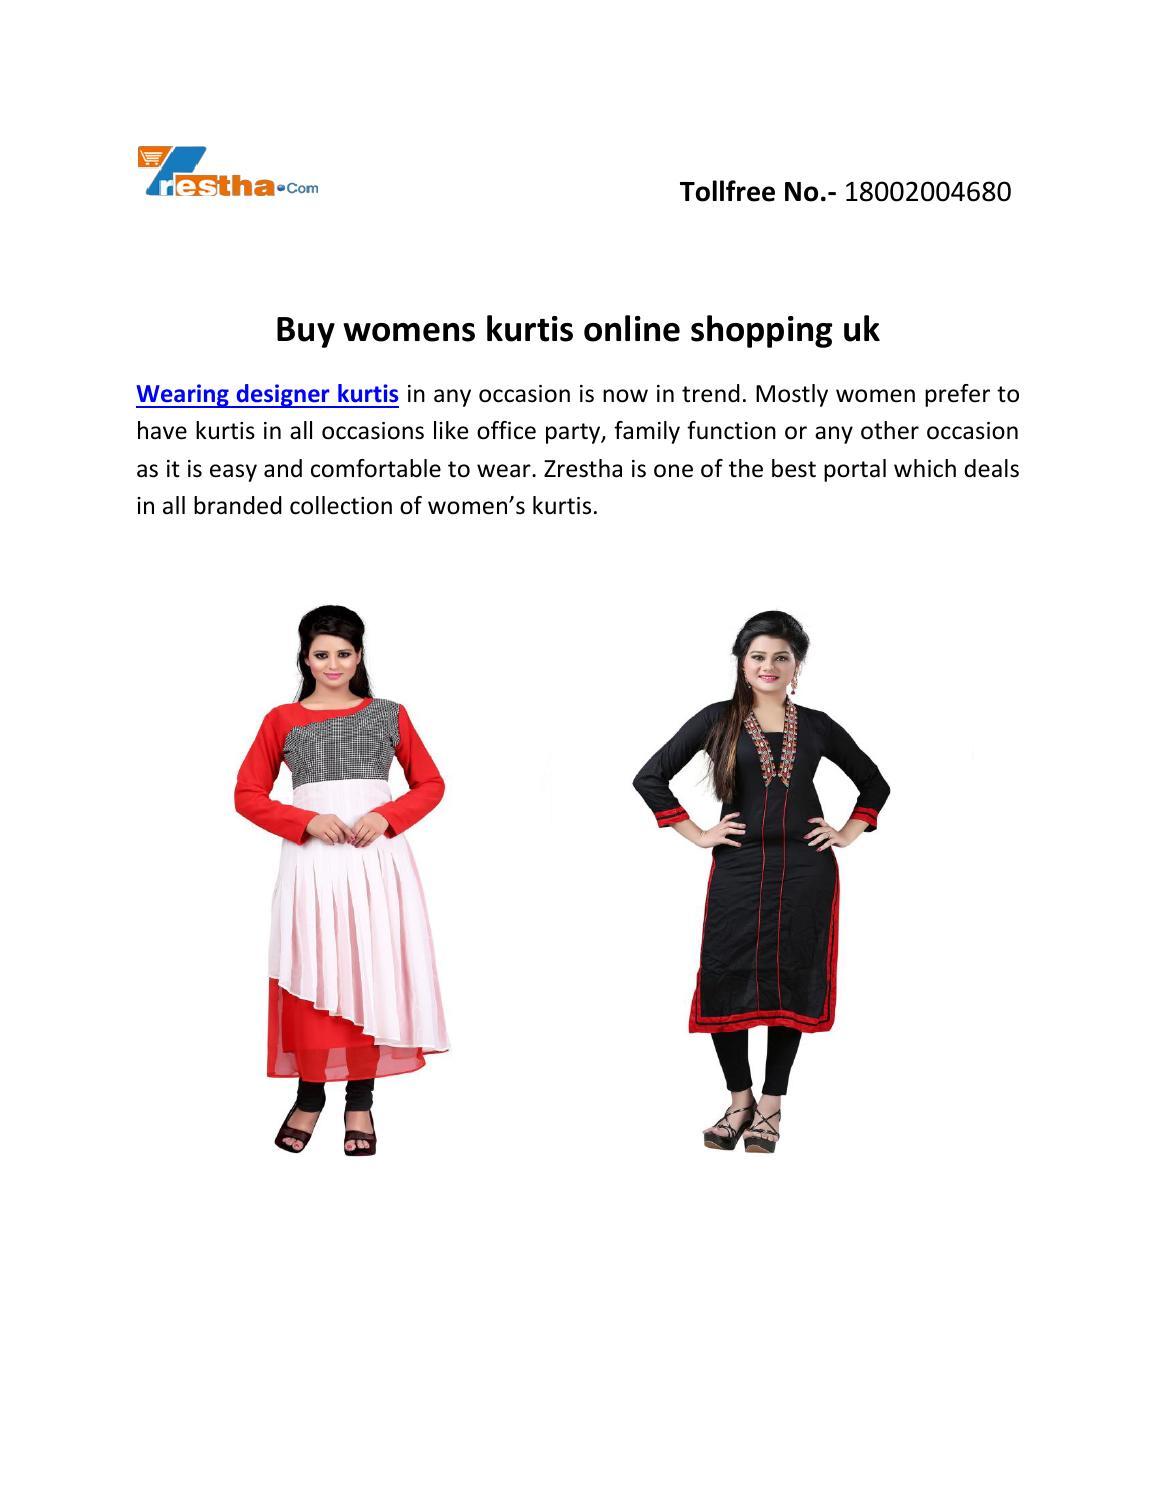 84258a9c53 Buy womens kurtis online shopping ukBuy Womens kurtis Online Shopping UK by  zresthamarketing - issuu